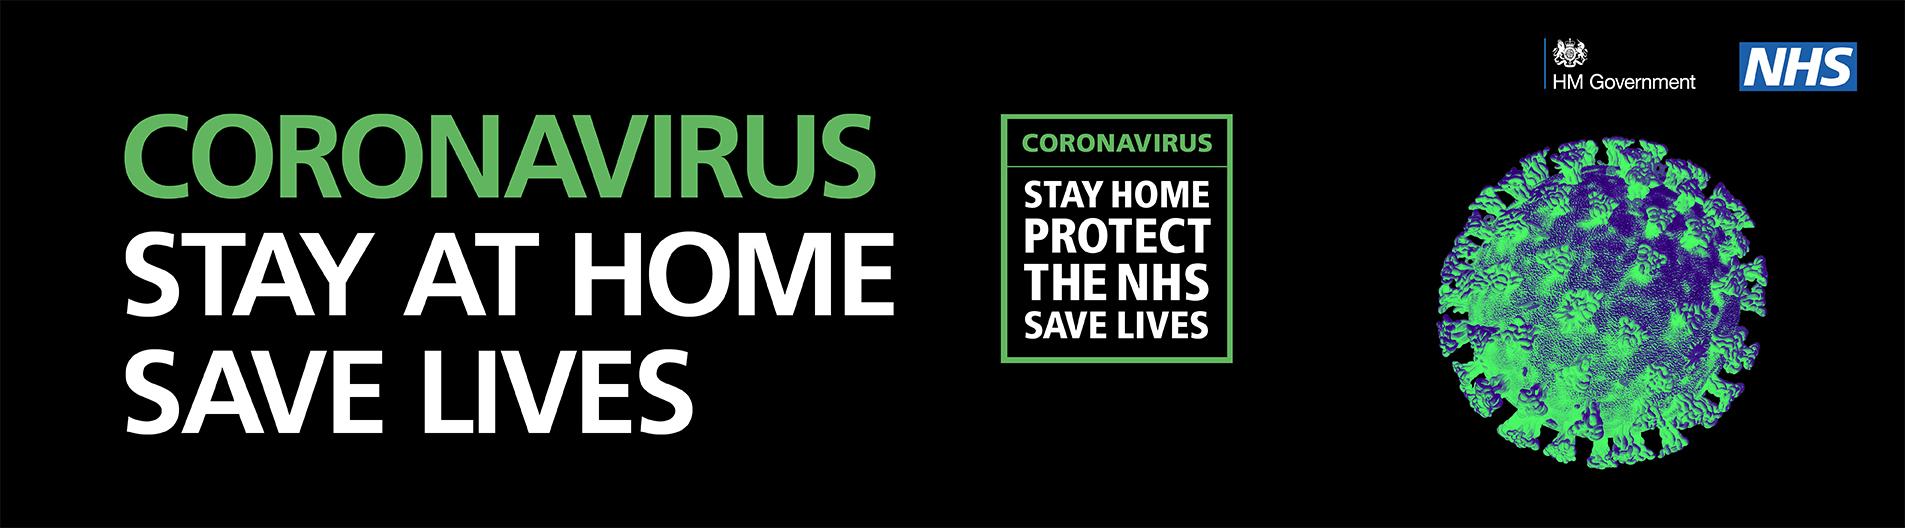 Coronavirus - Stay at Home - Save Lives